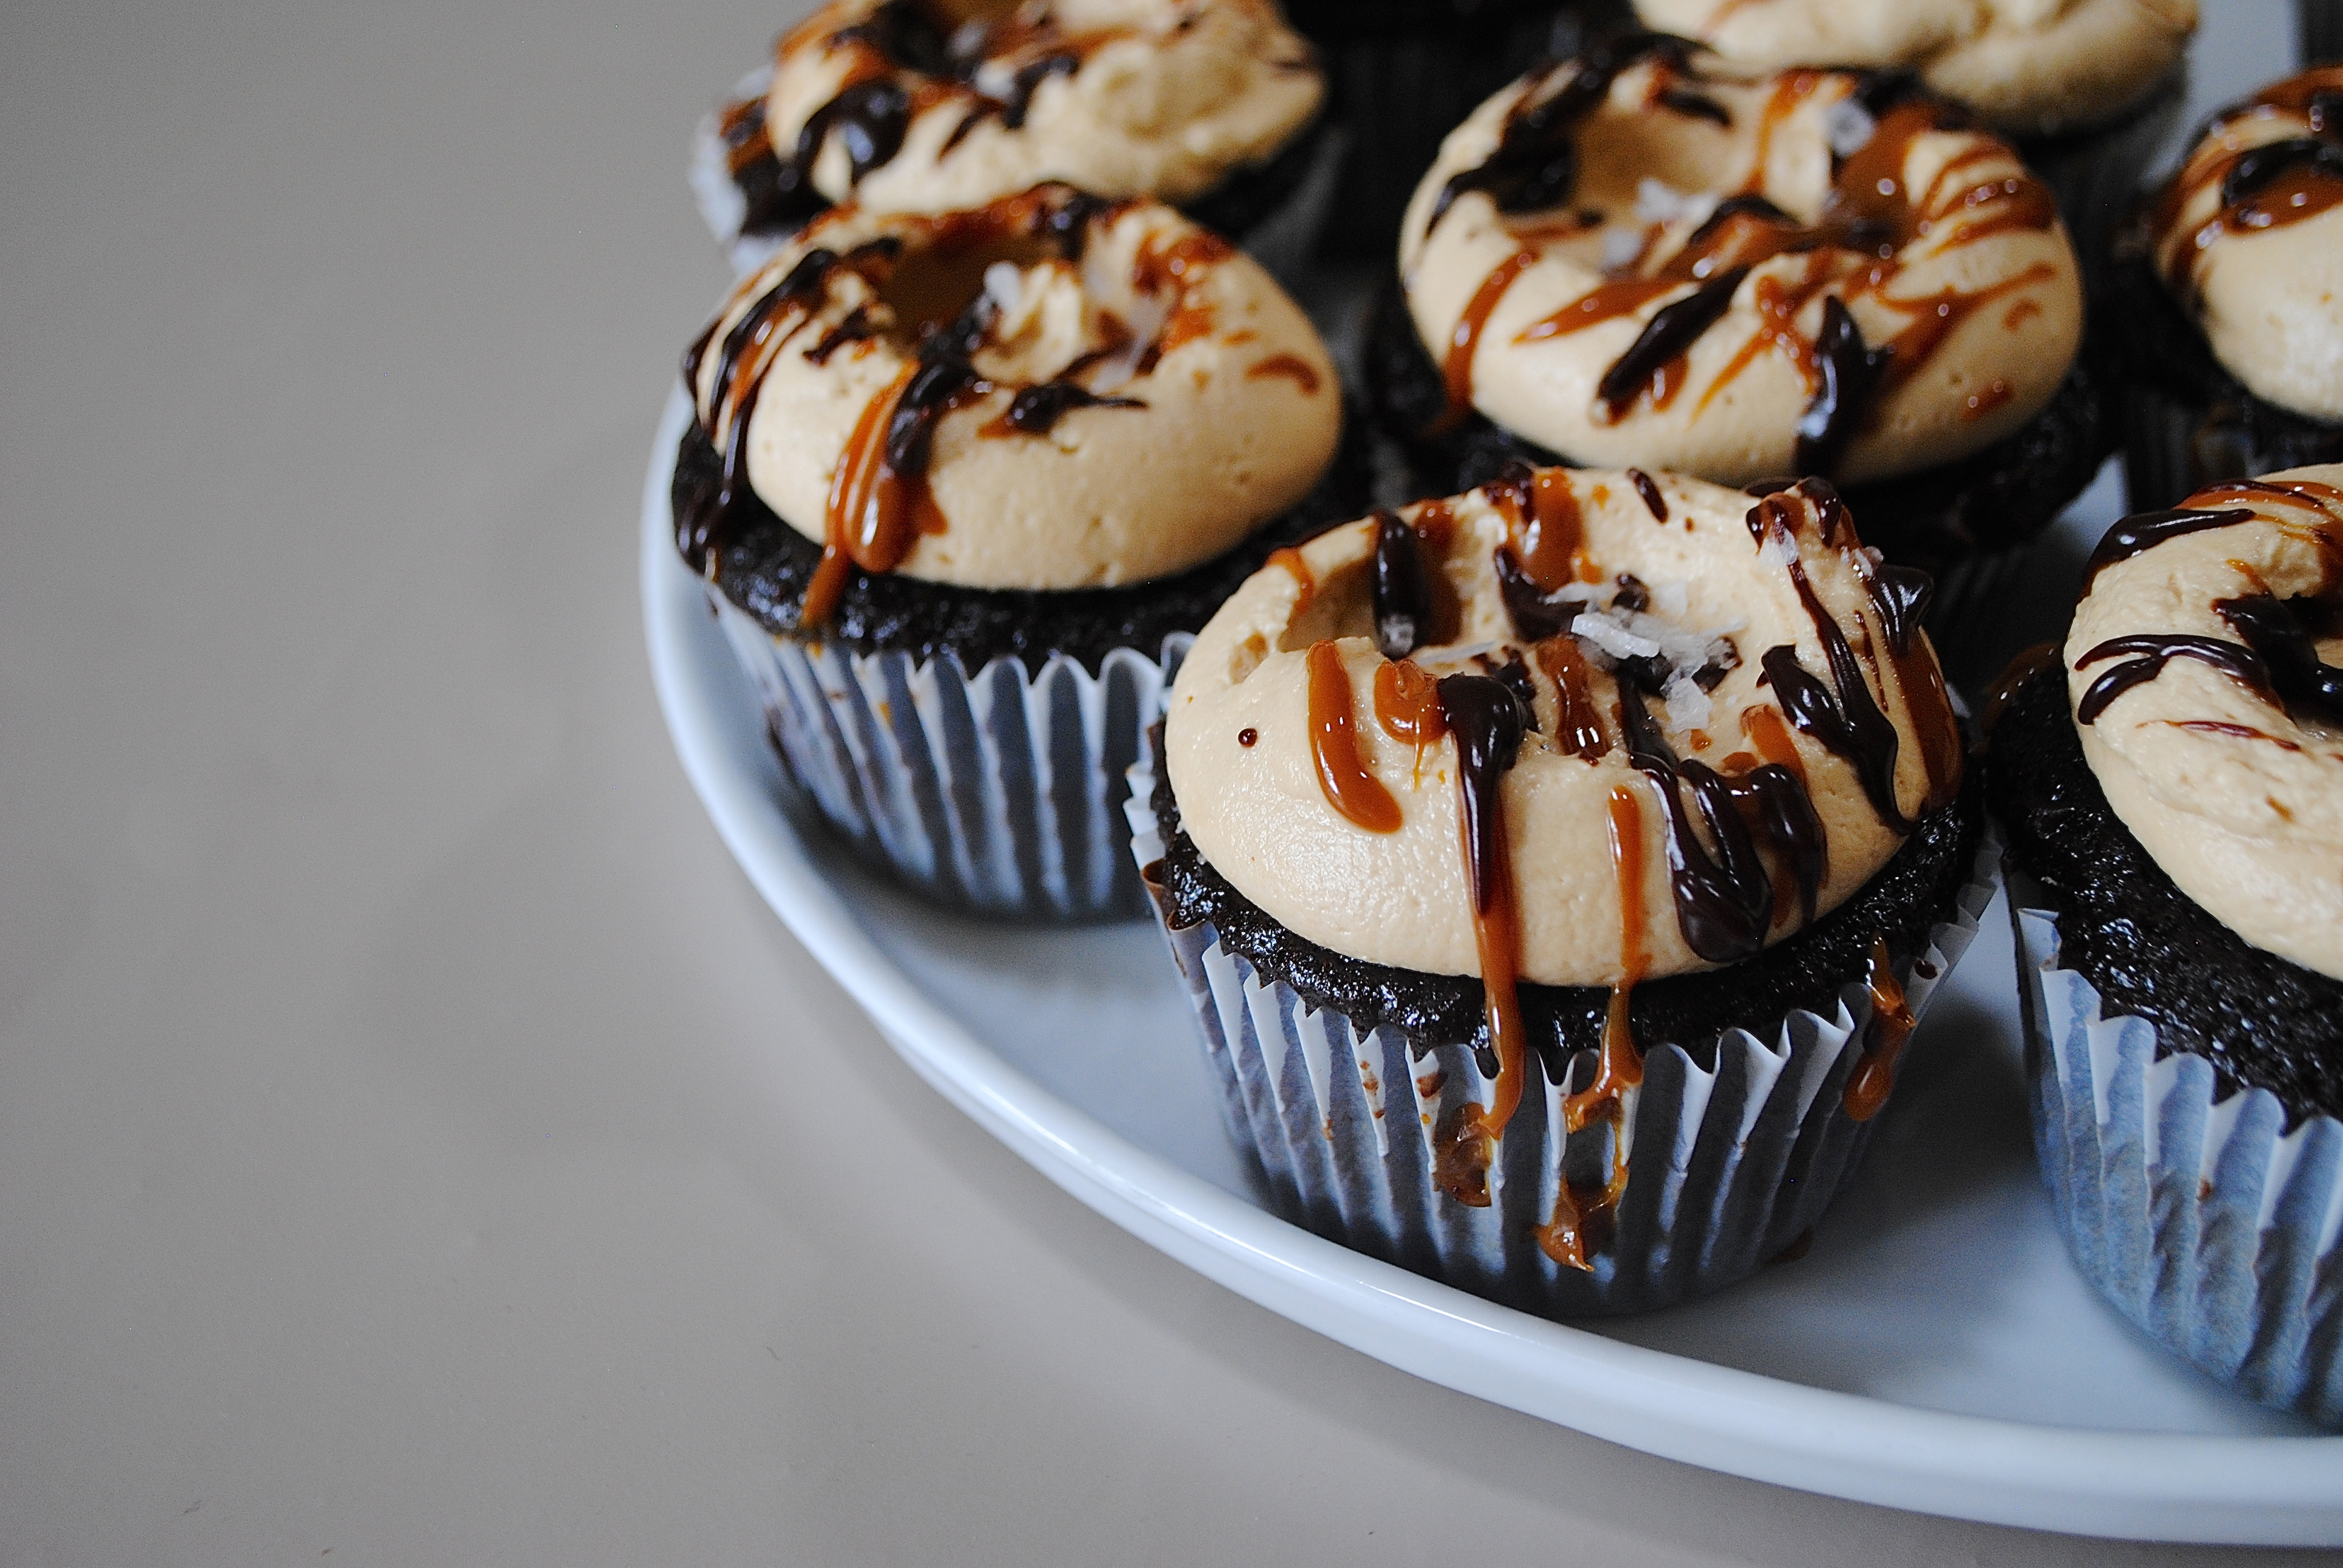 Ina Garten Cupcakes cupcakes | blessings + good food